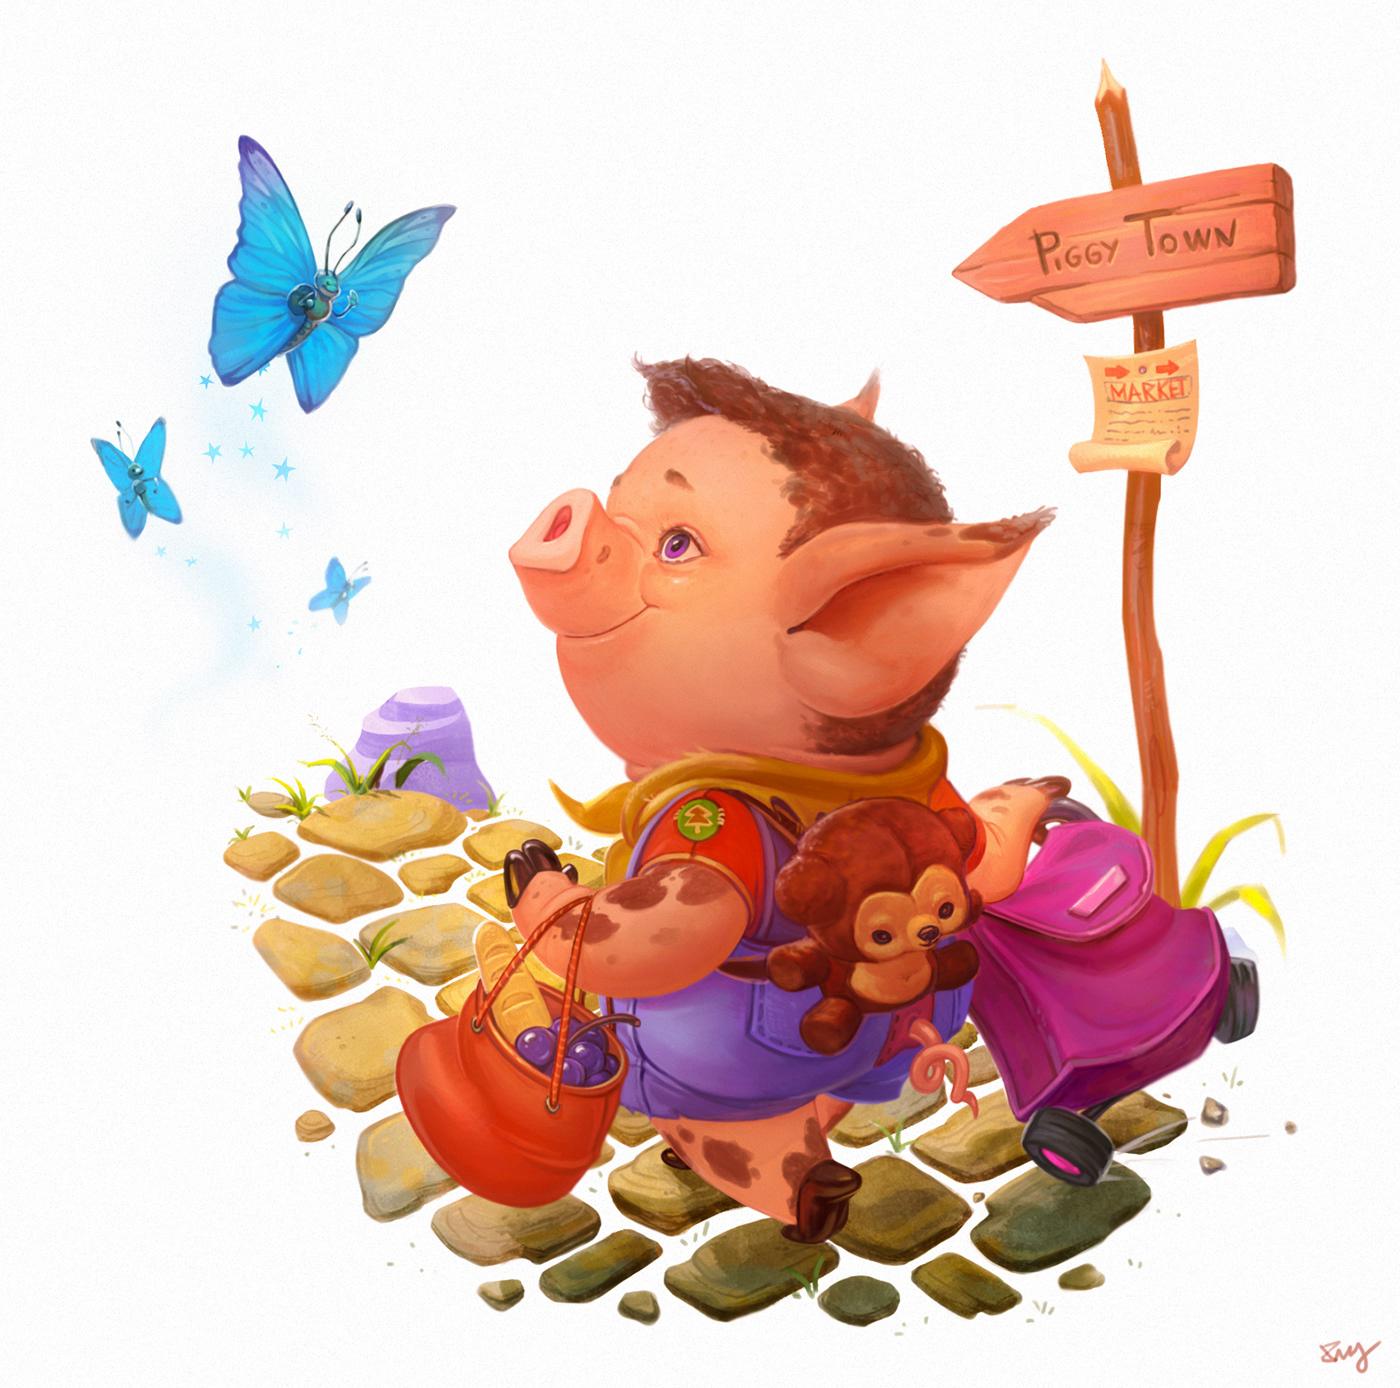 pig nursery rhyme story children's ILLUSTRATION  storybook happy piggy Shopping